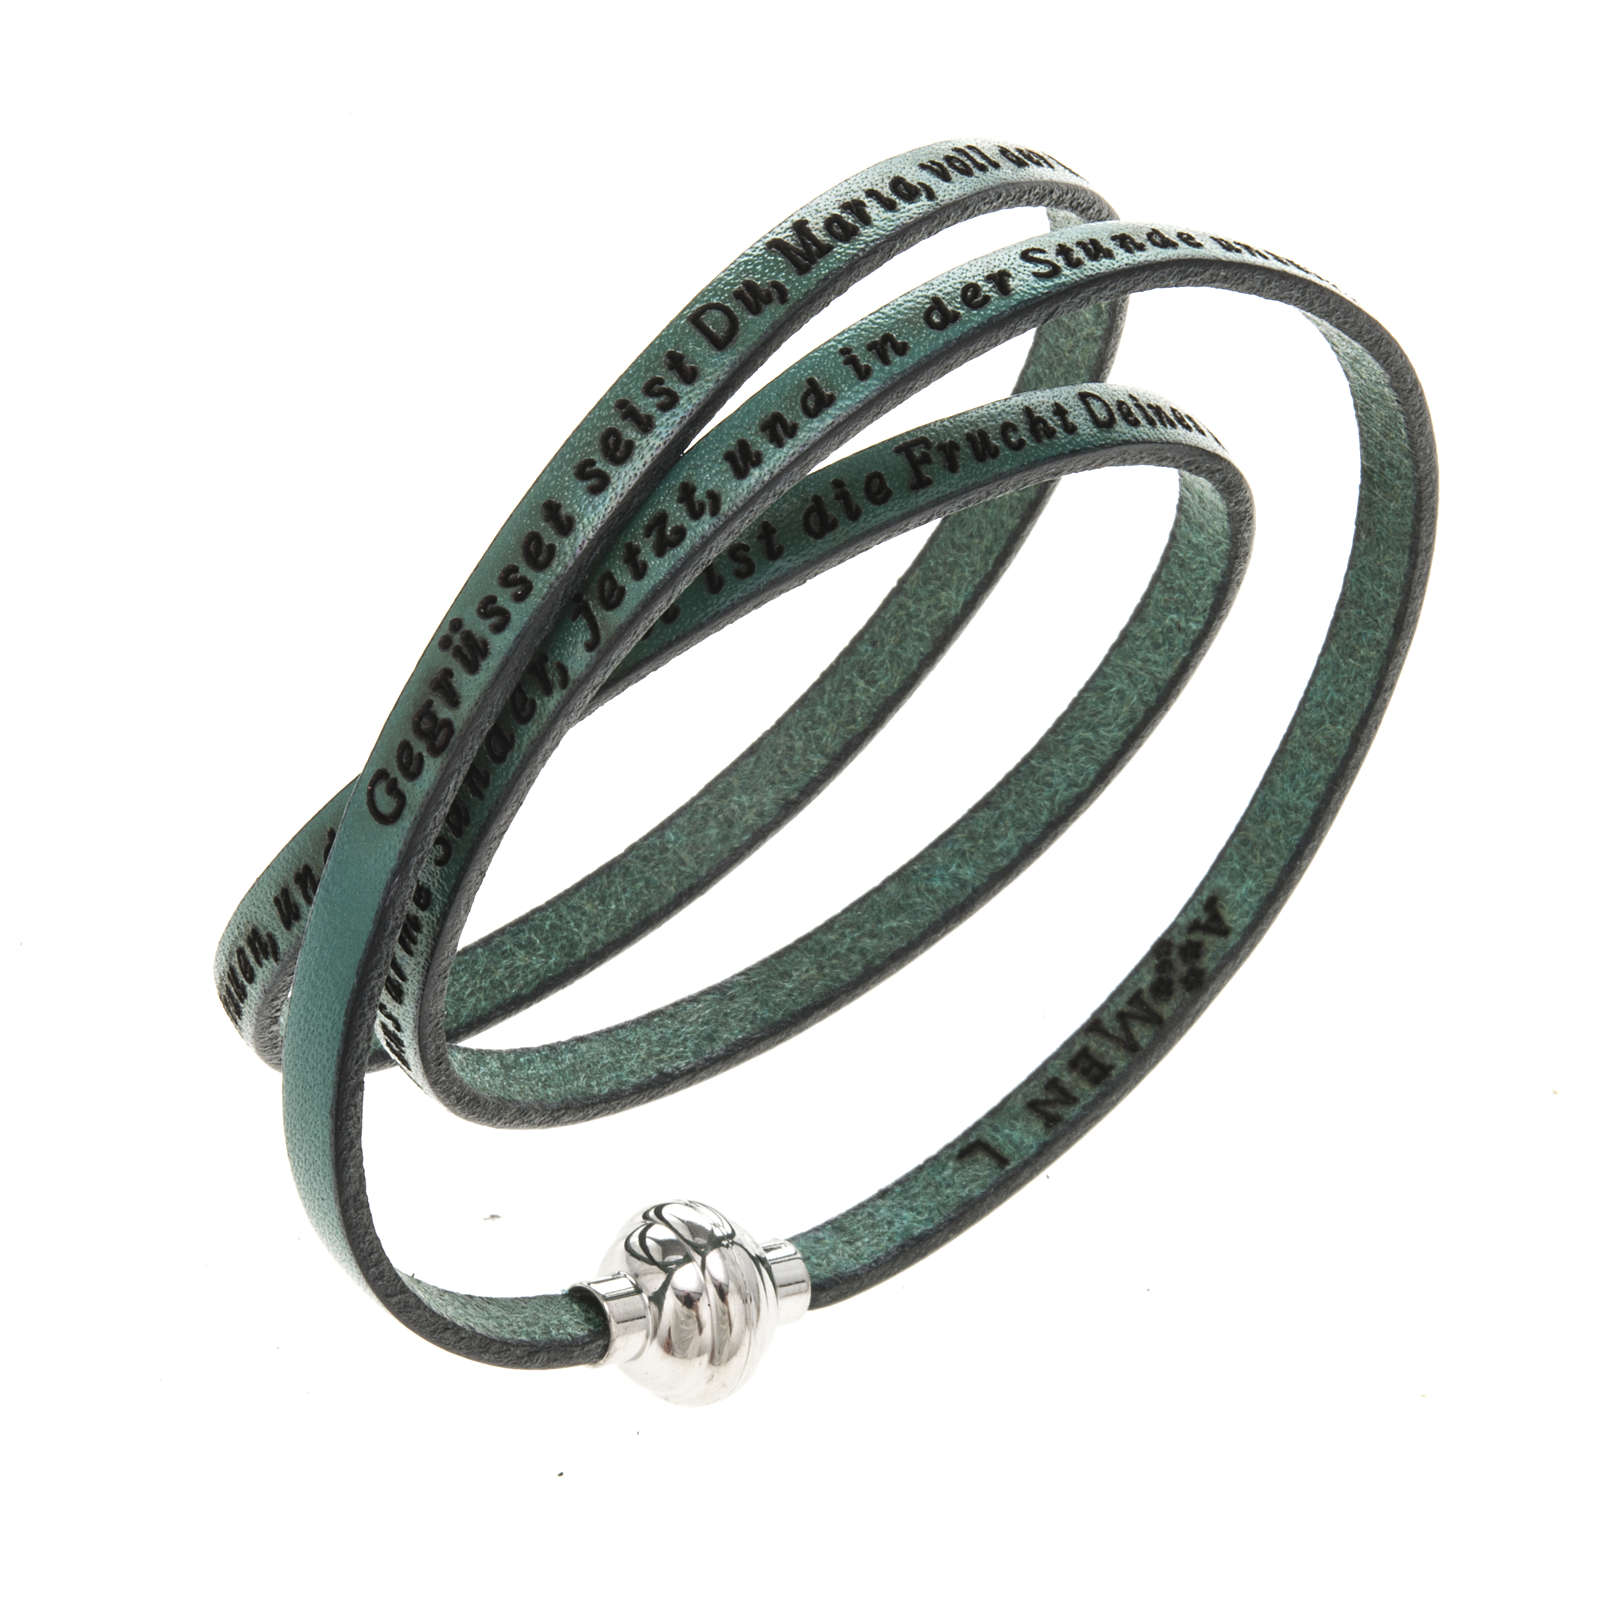 Amen Bracelet in green leather Hail Mary GER 4